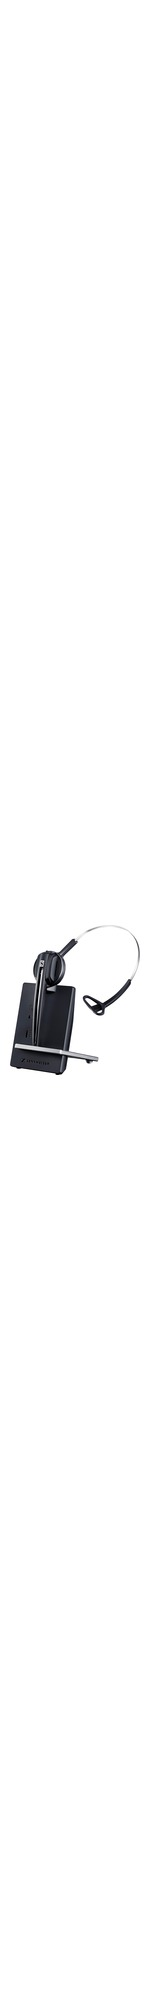 Sennheiser D 10 USB ML Wireless DECT CAT-iq Mono Headset - Over-the-head, Over-the-ear - Supra-aural